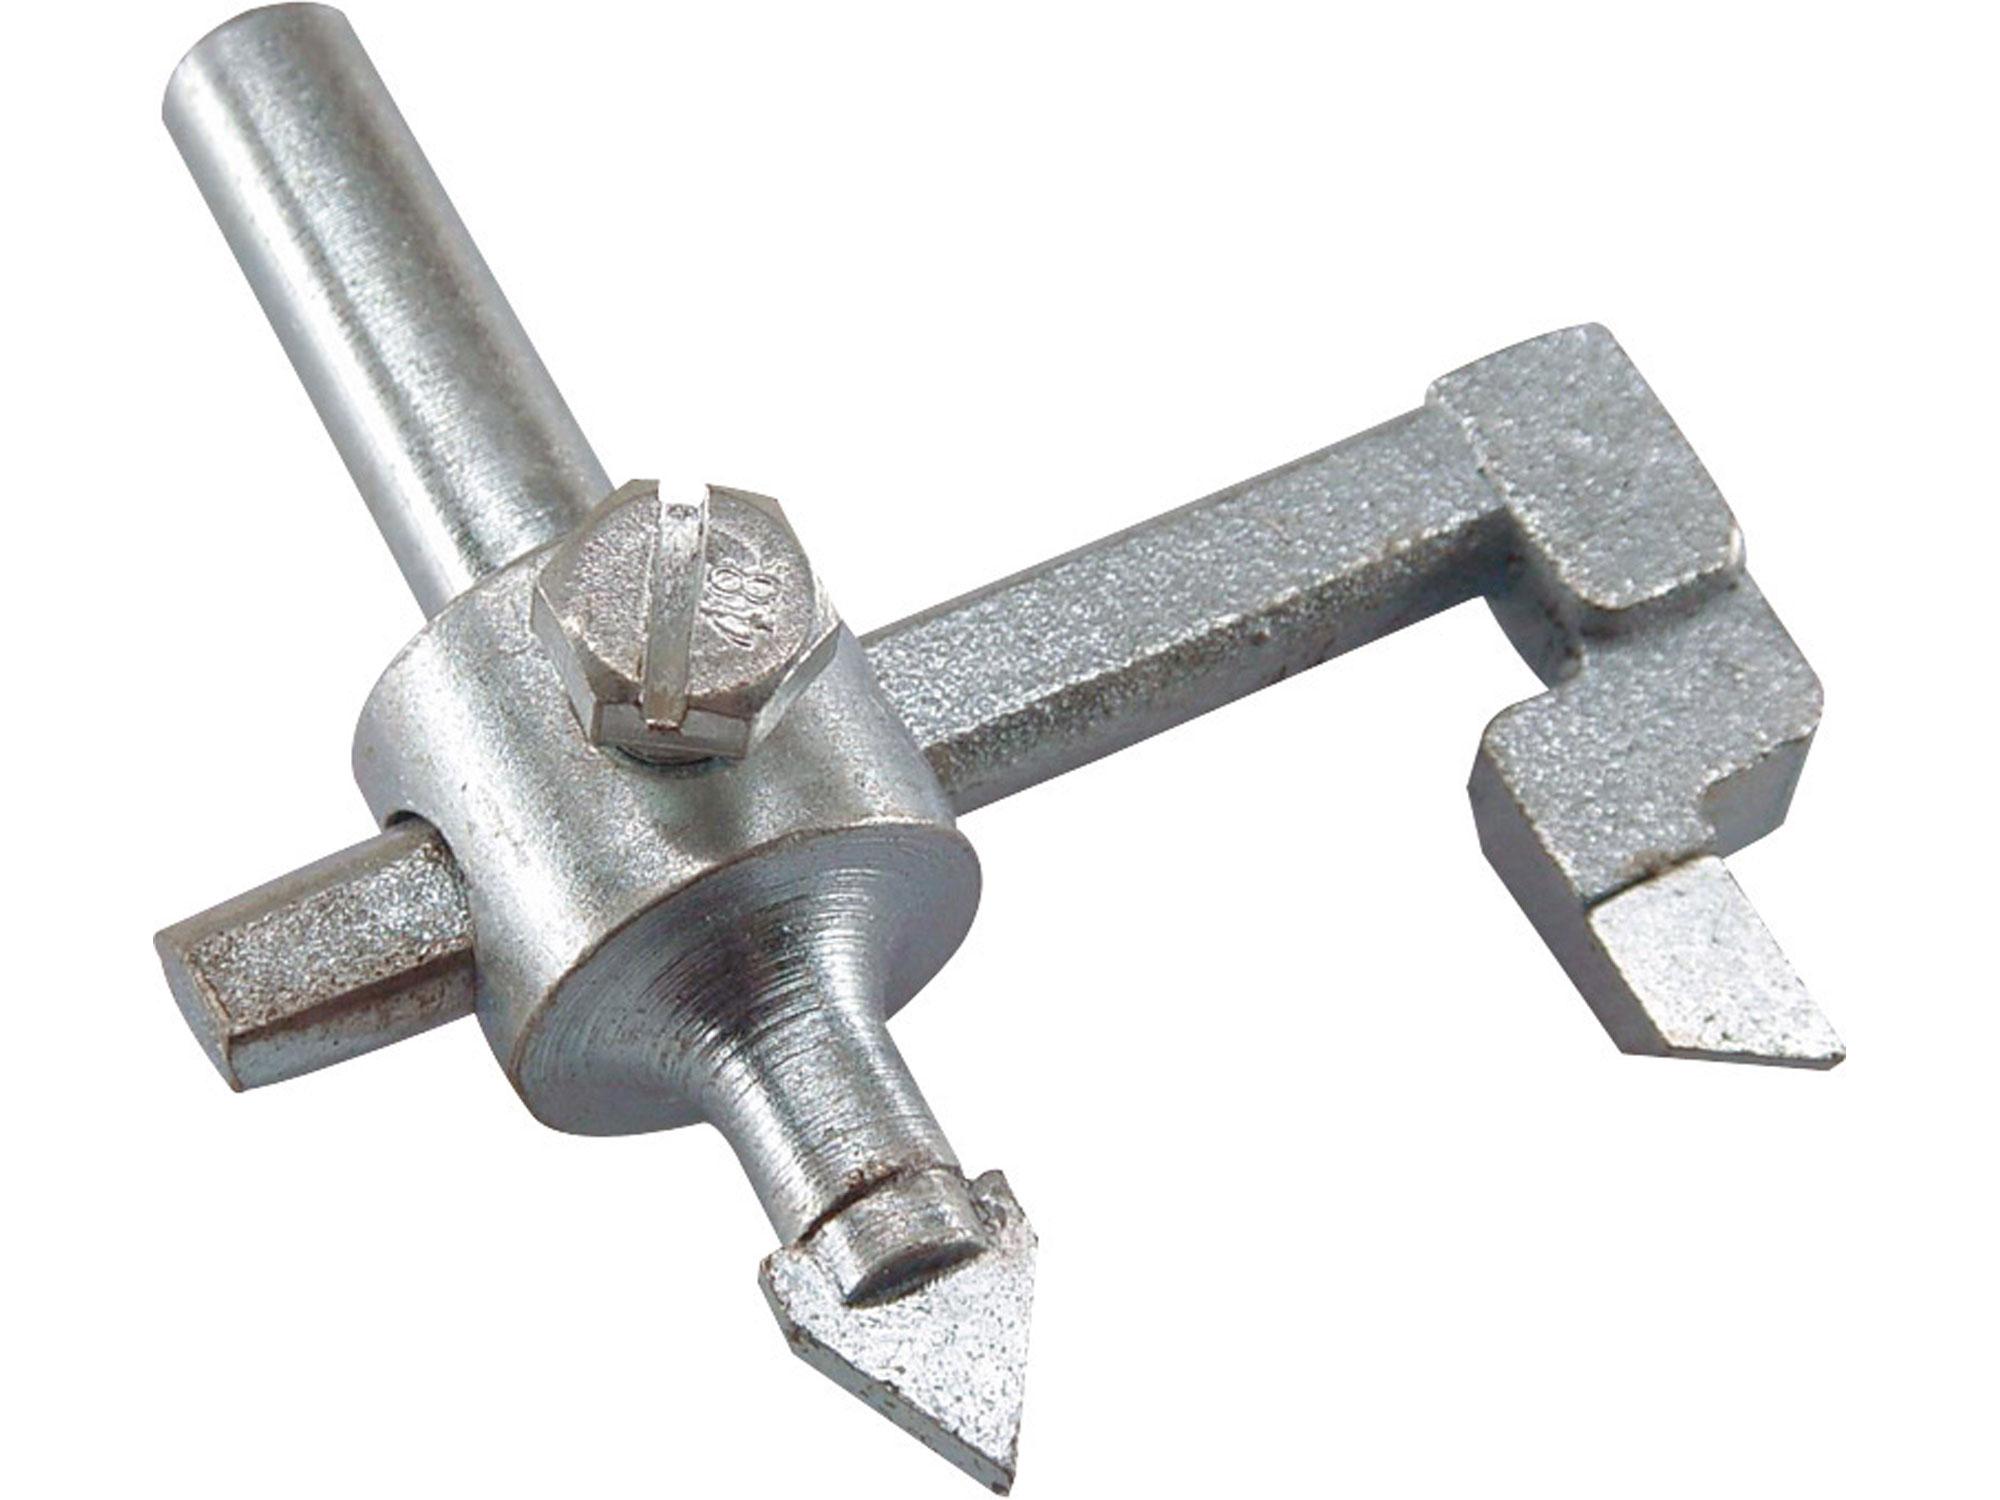 Circular Tile Cutter, 20 to 90mm Diameter Holes